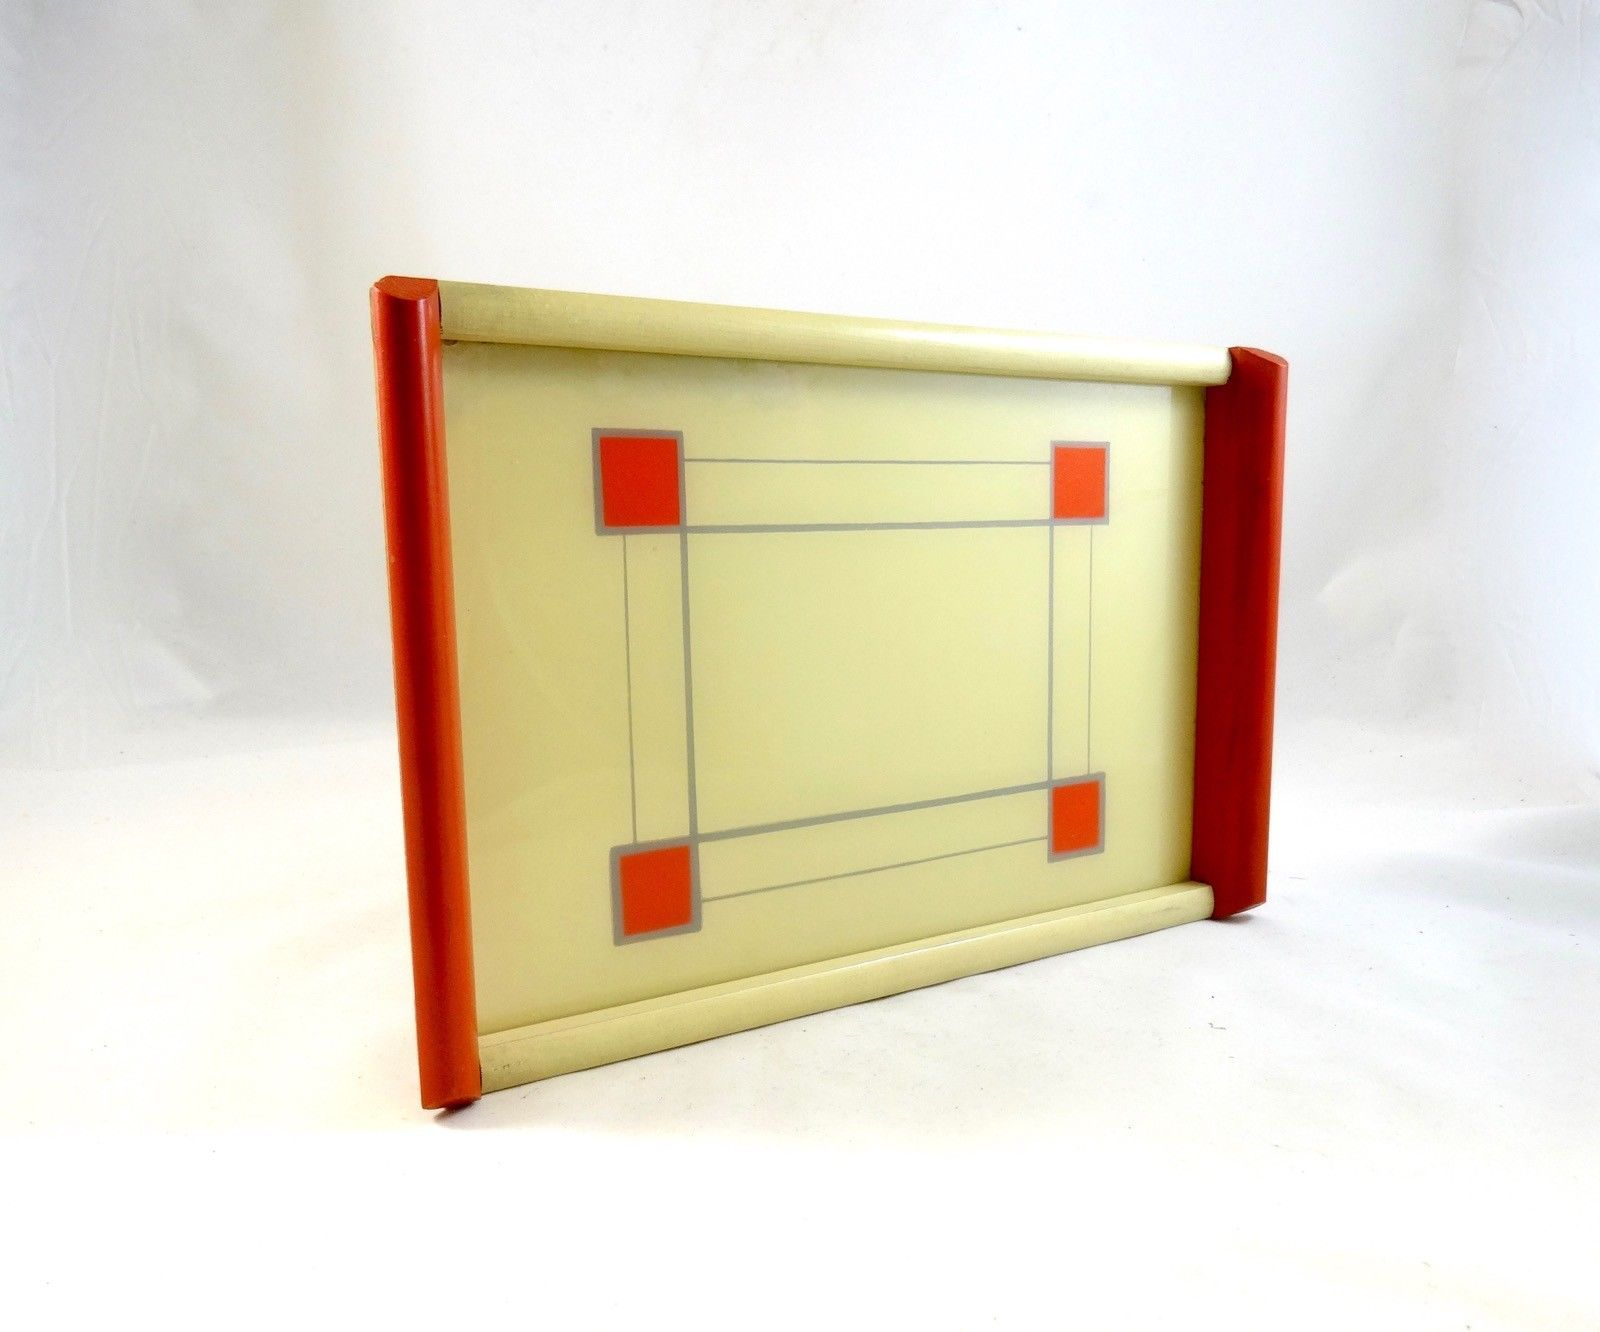 Art Deco Stijl : Rare de stijl small cocktail tray netherlands art deco bauhaus